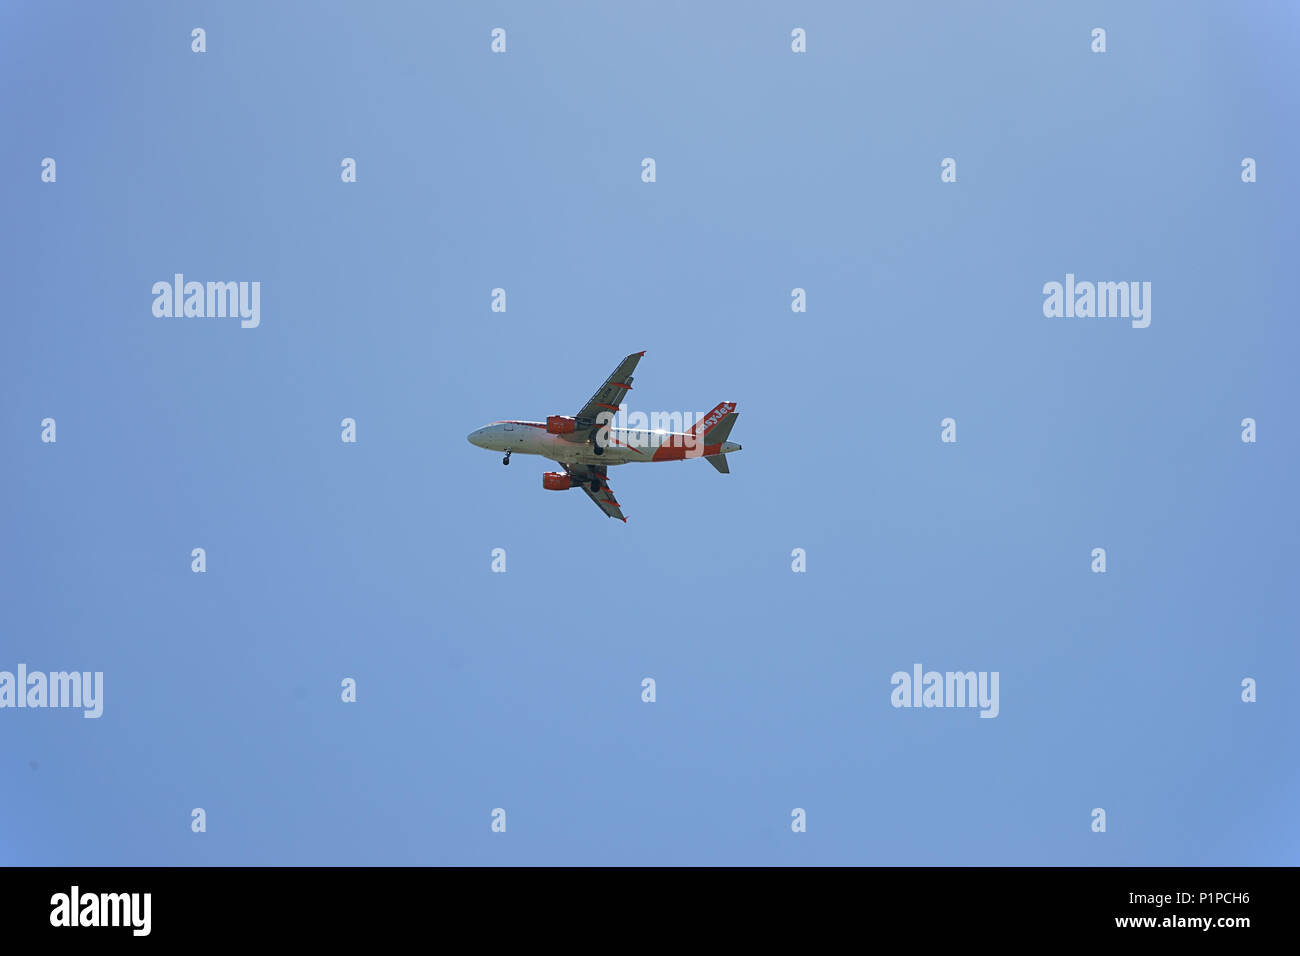 Easyjet Airplane in the sky - Naples, italy Stock Photo